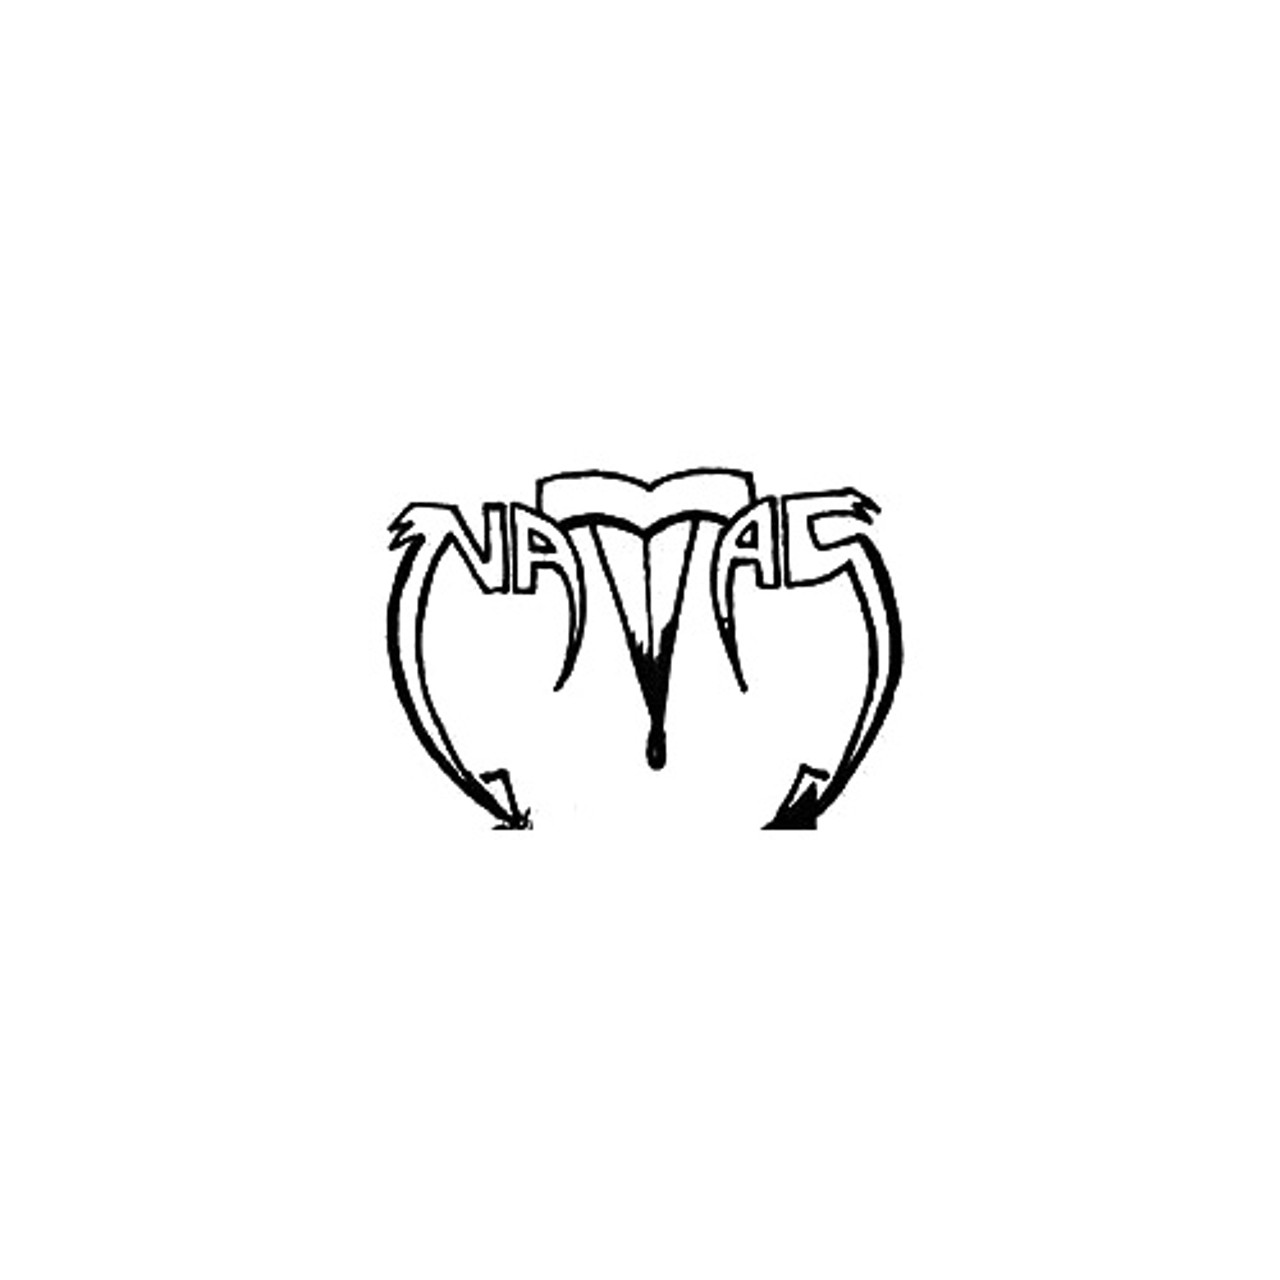 Natas Vinyl Sticker